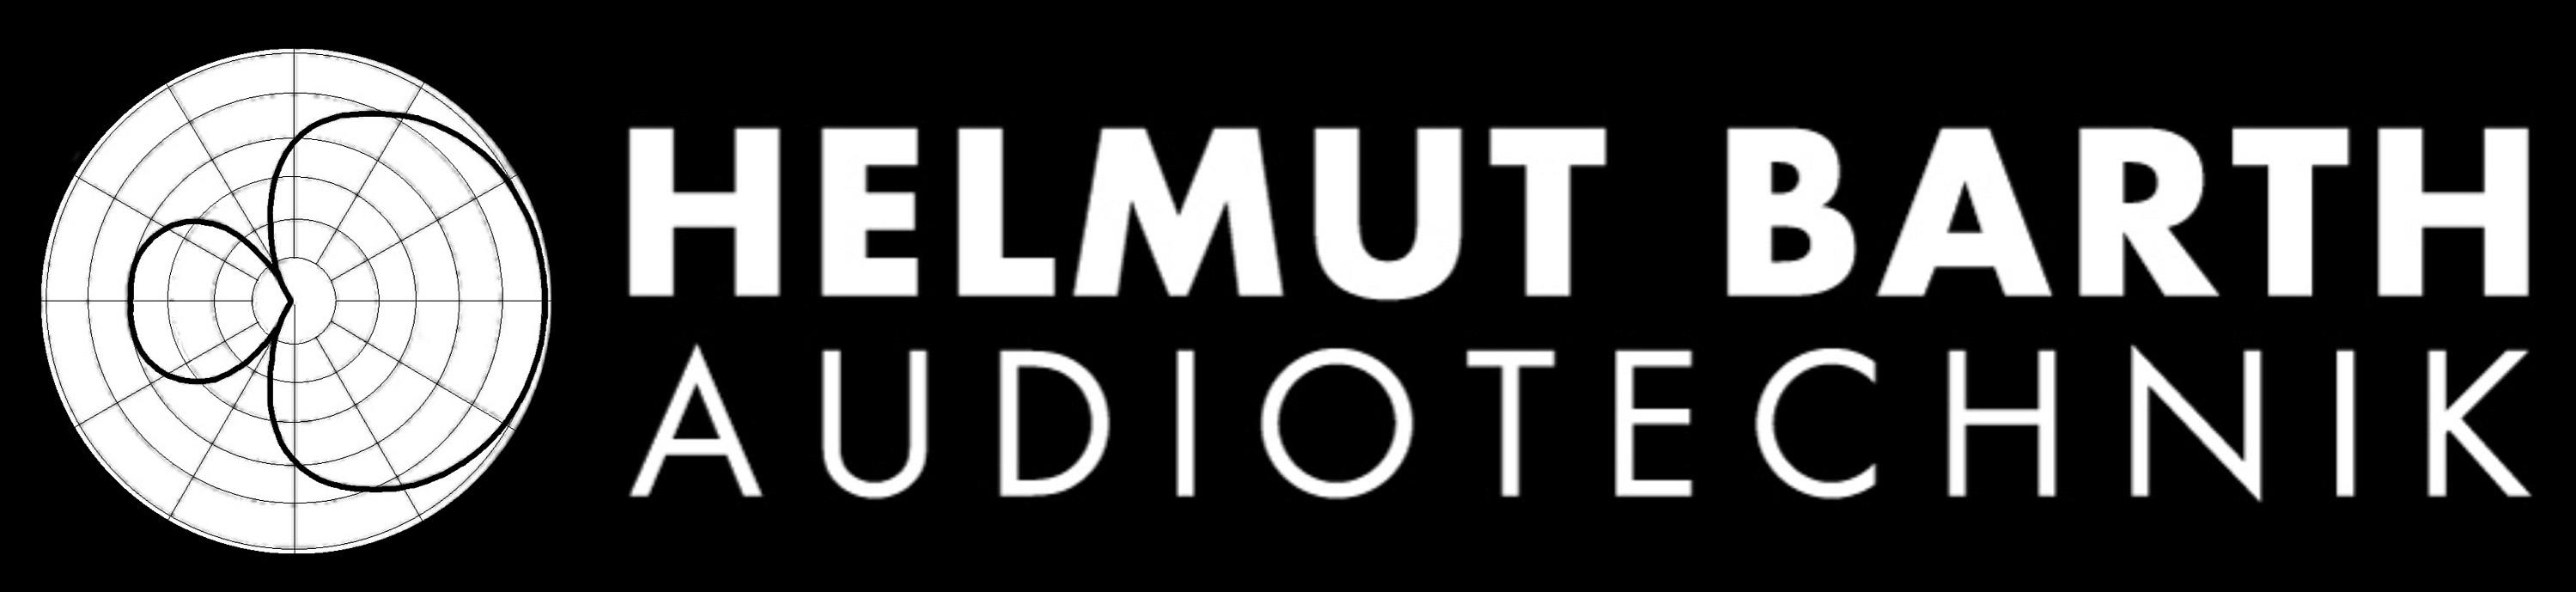 Logo Helmut Barth Audiotechnik